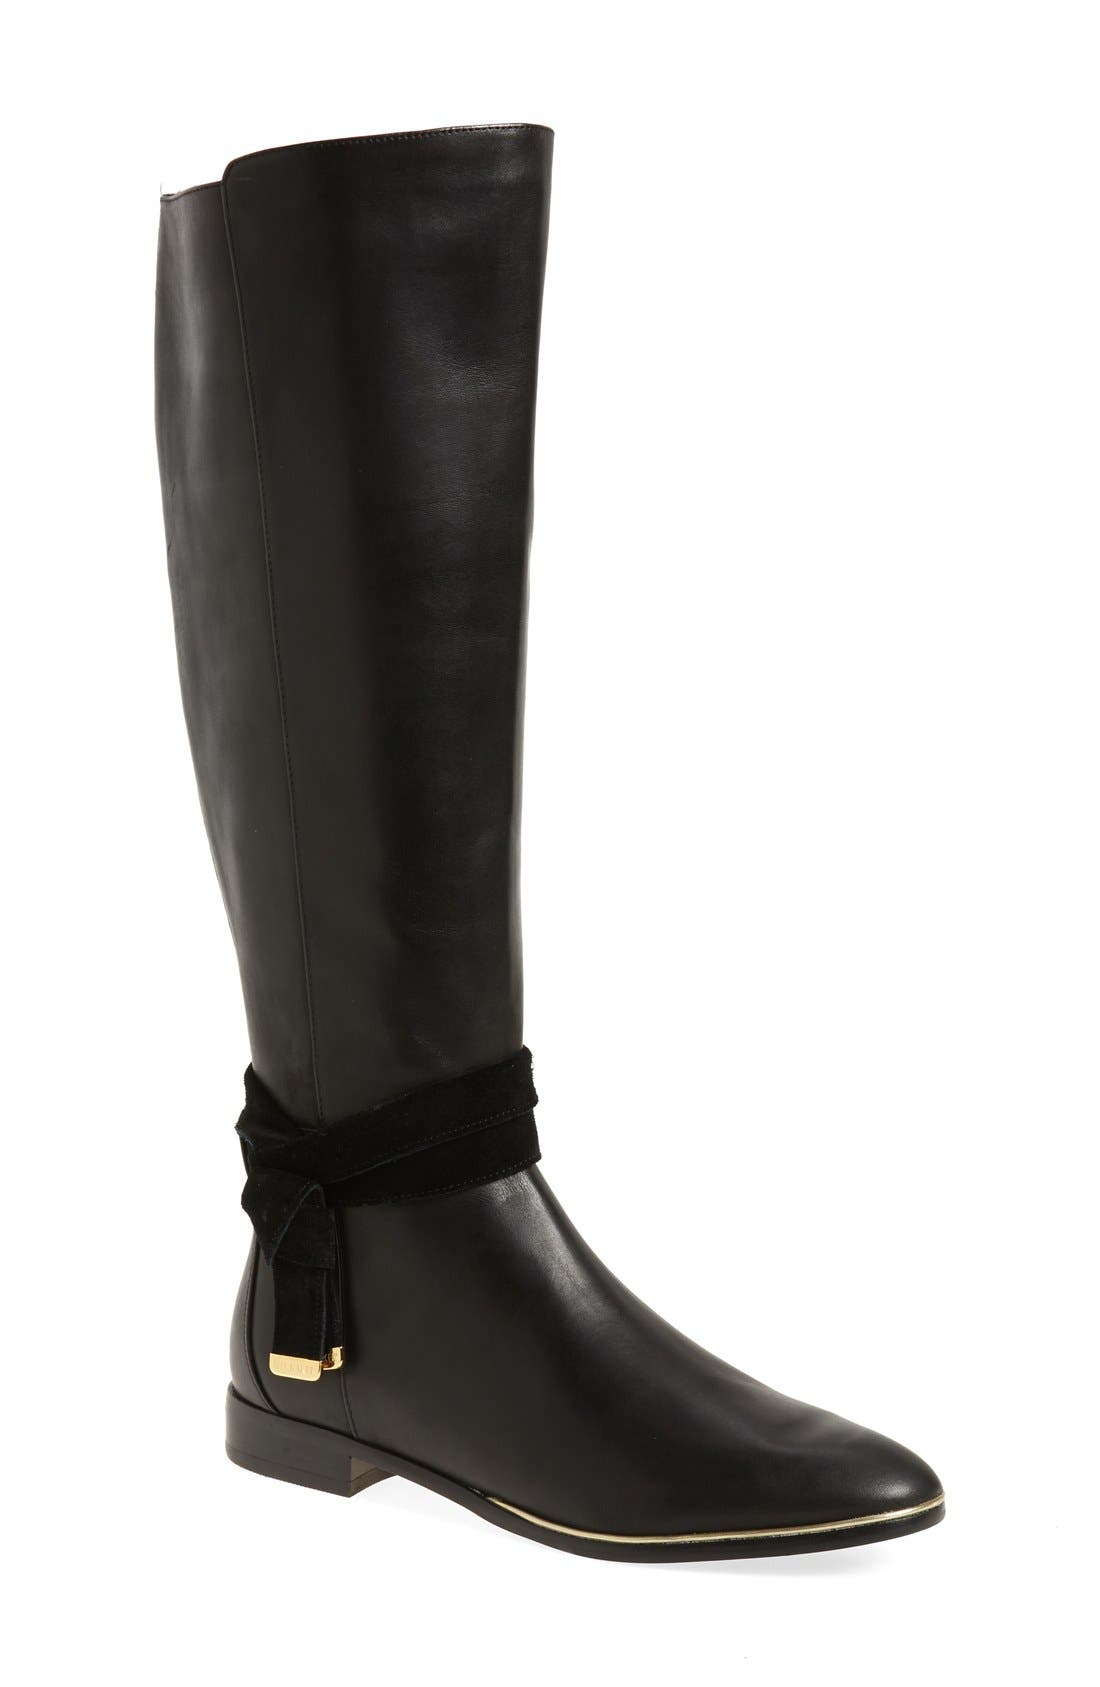 Alternate Image 1 Selected - Ted Baker London 'Enjaku' Tall Boot (Women)